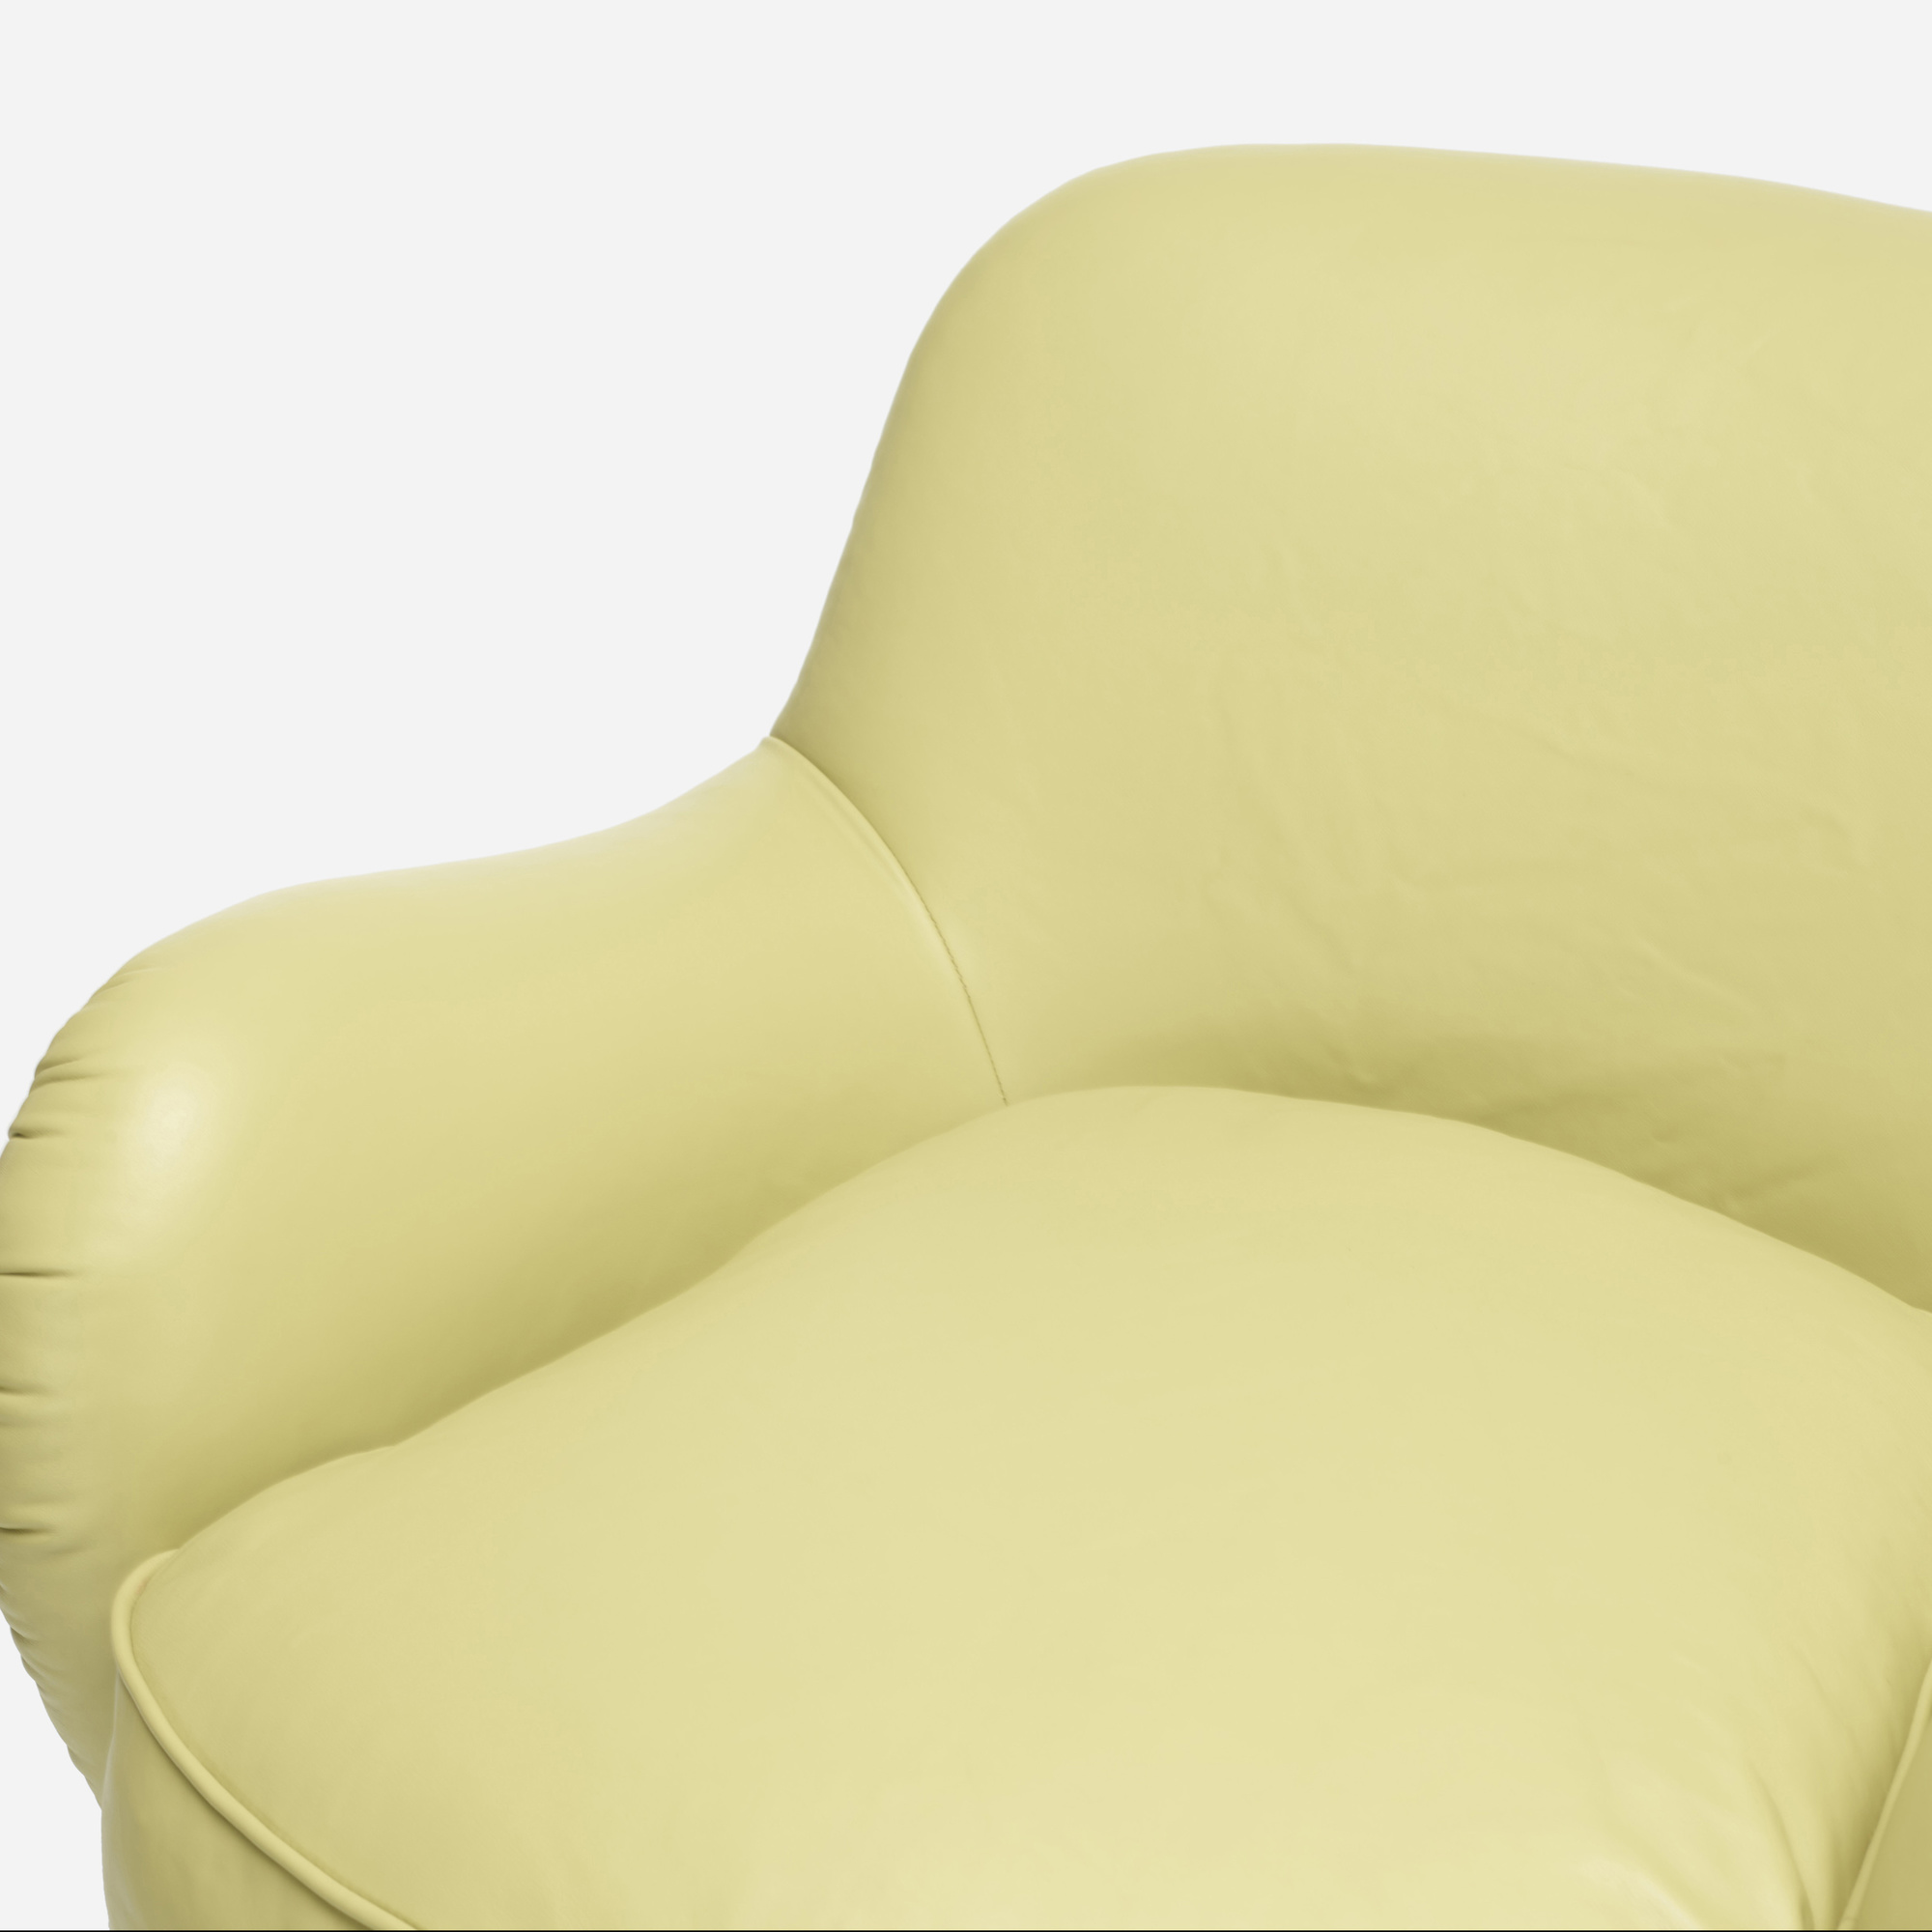 361: Vladimir Kagan / Barrel lounge chairs model 100A, pair (2 of 2)